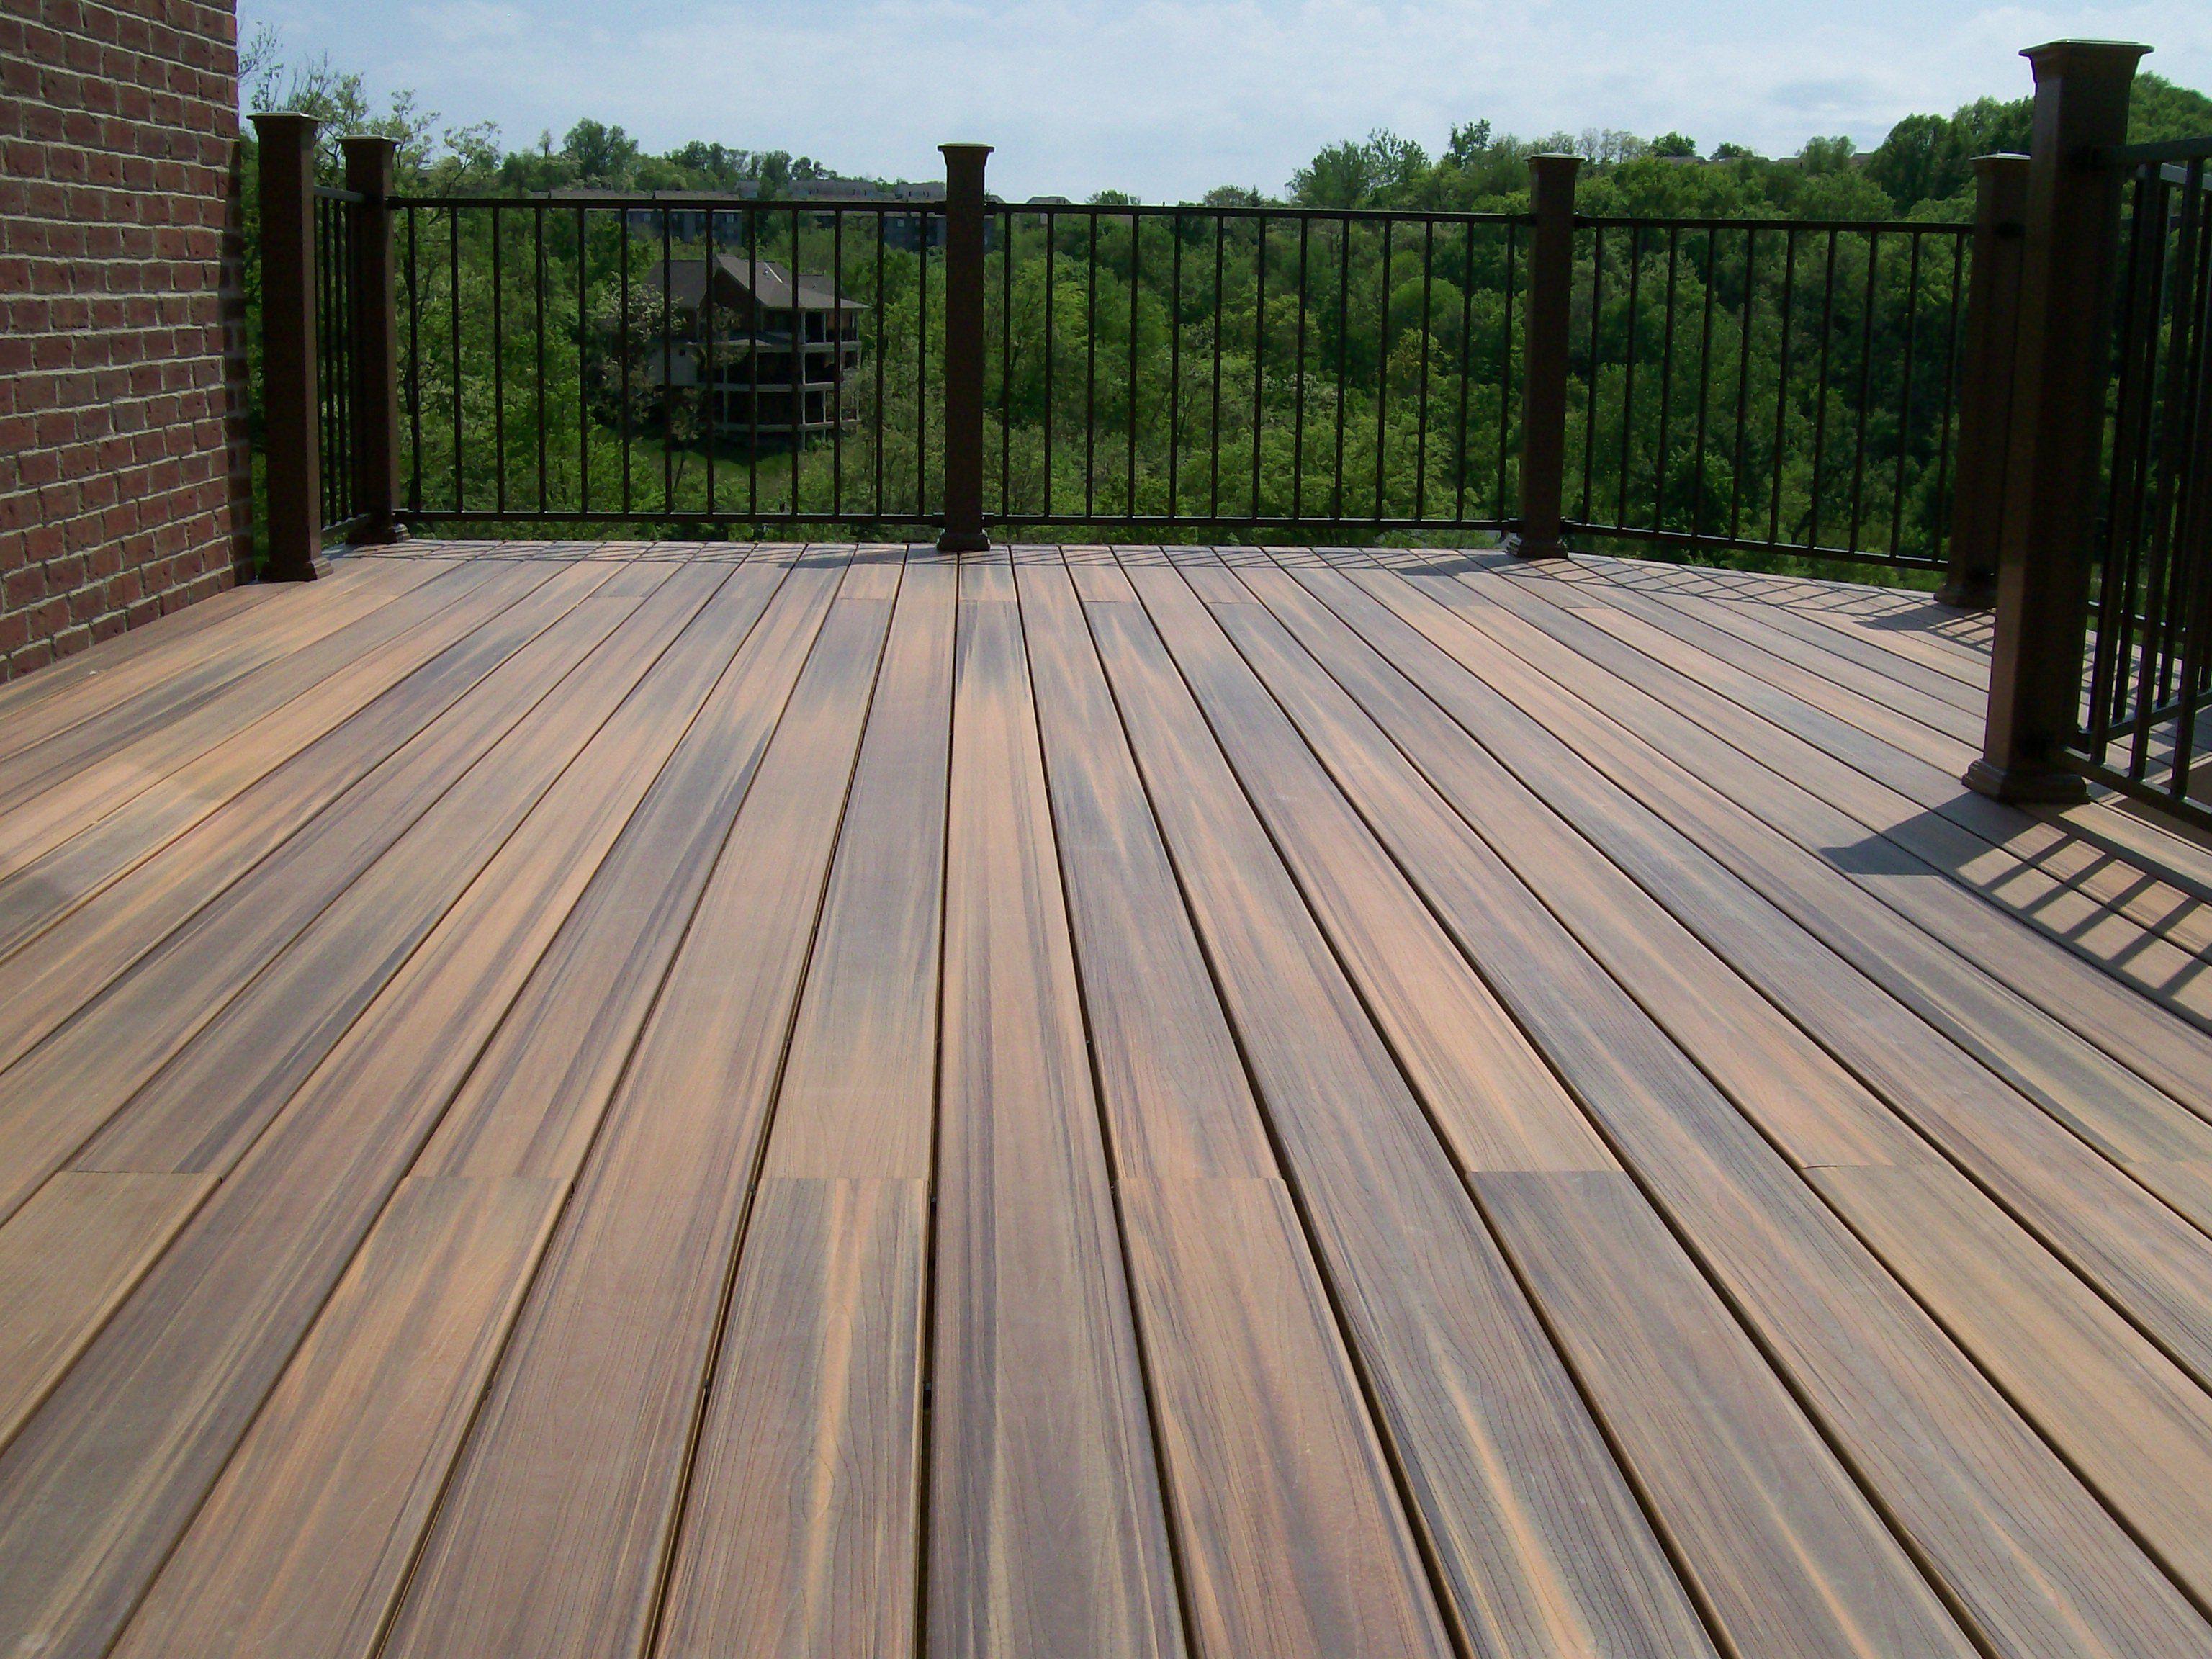 the garden together with patio decking screws cashaowd739 over blog com